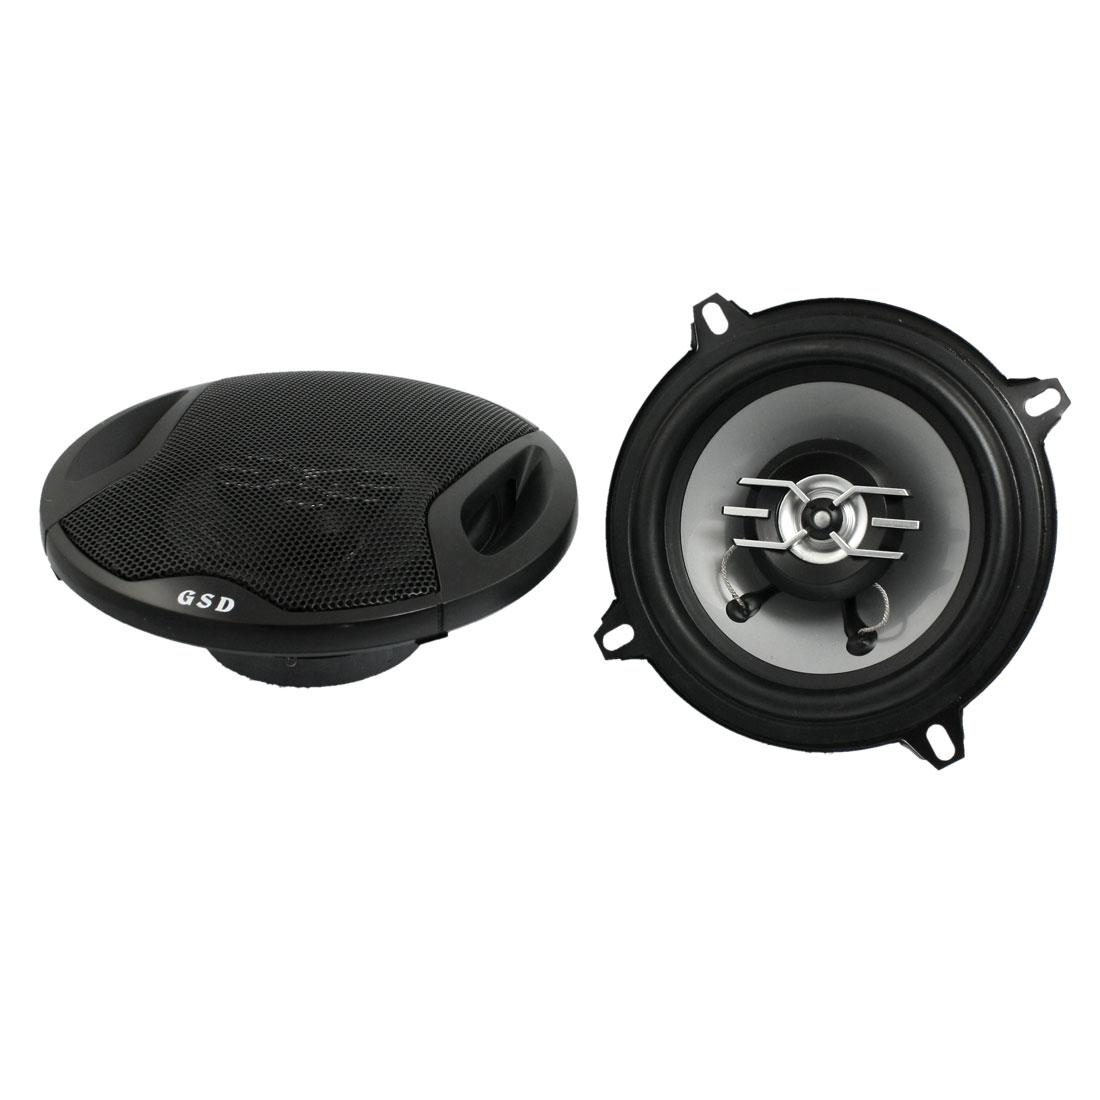 "5"" Diameter 500W 2-way Two Coaxial Car Audio Speakers Black 2 Pcs"